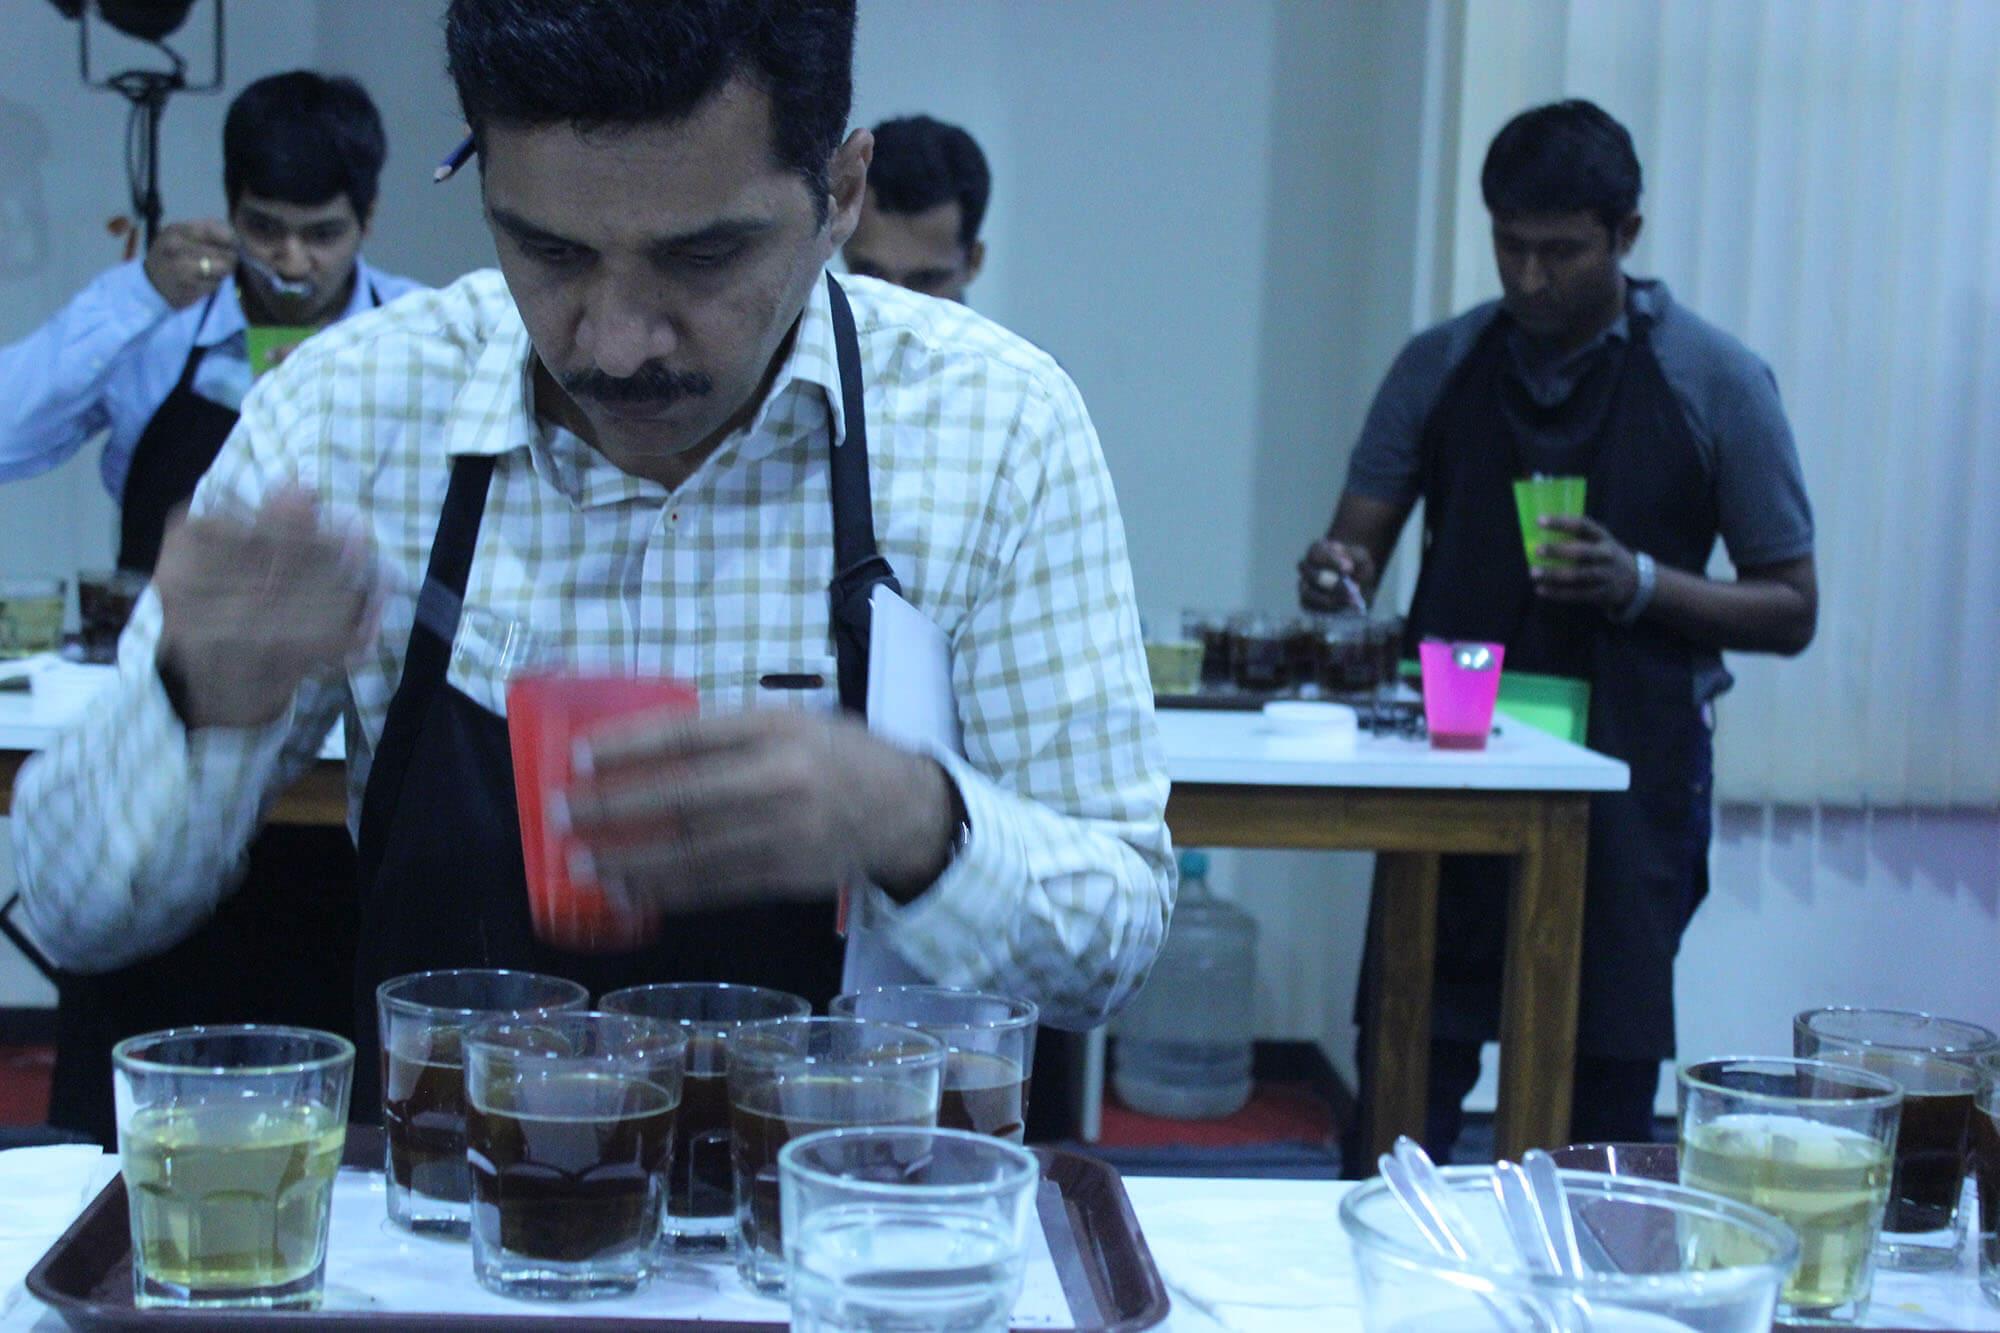 Red Sirocco Coffee Q Grader Arabica Coffee Training 16